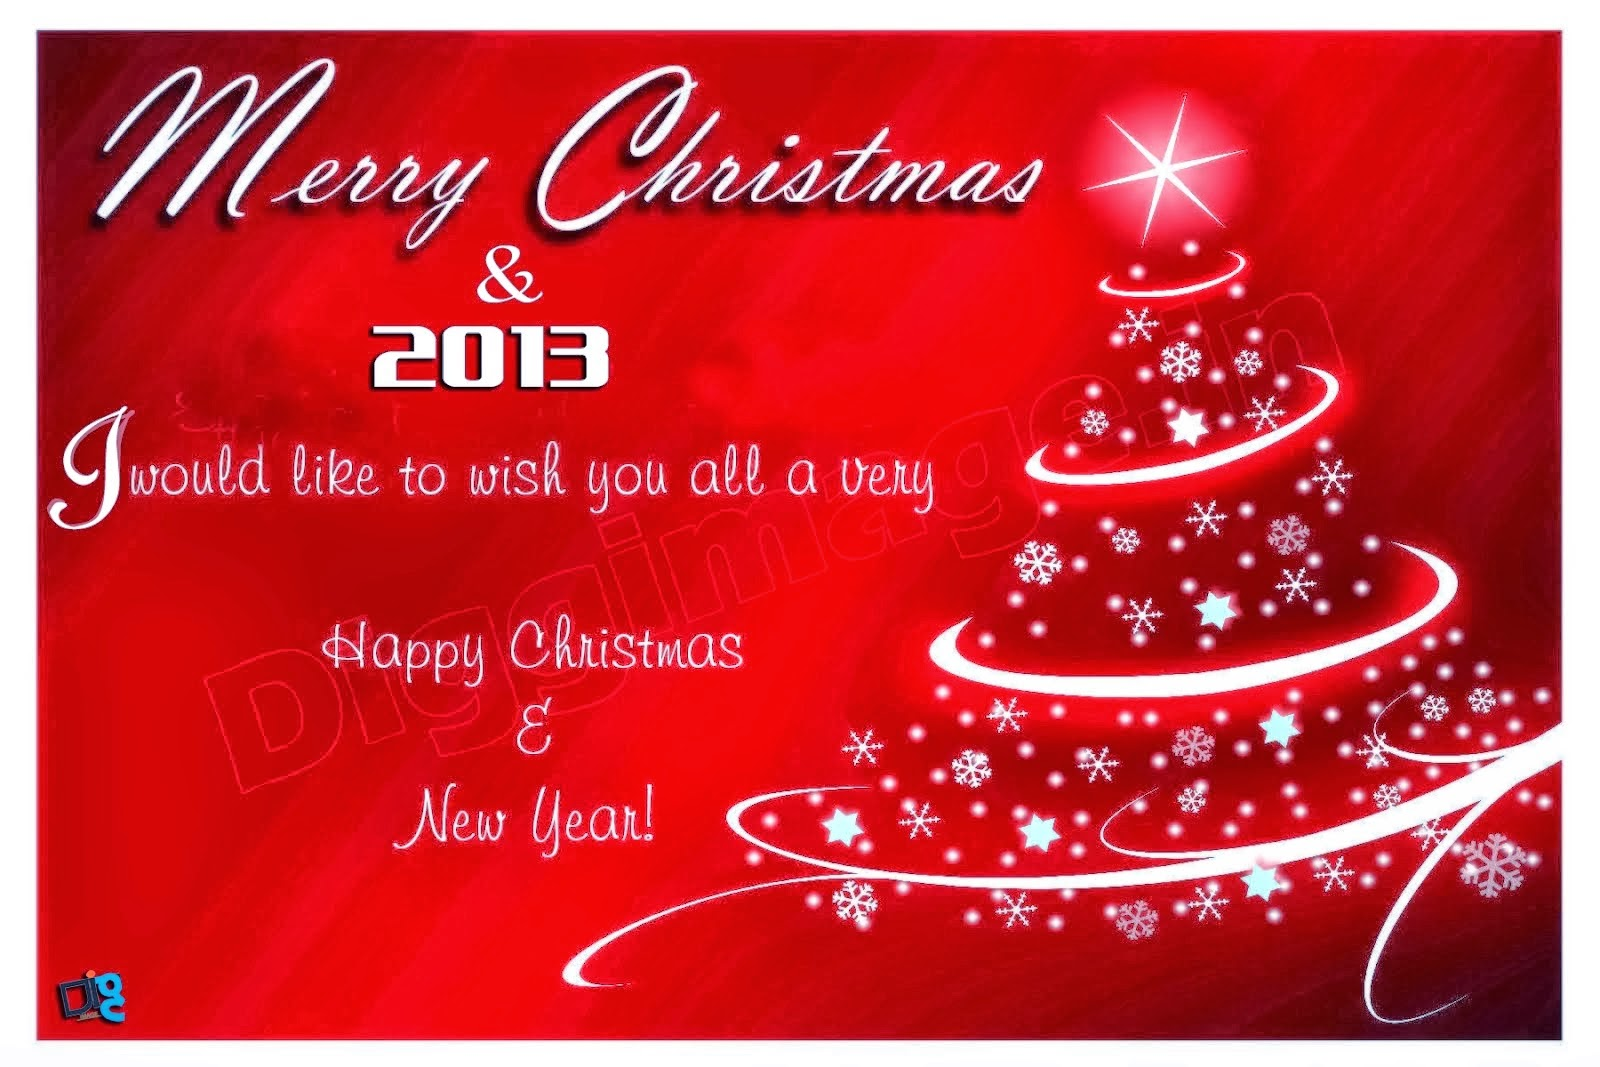 Top Hd Christmas Cards Wallpaper: Merry Christmas Greetings HD Wallpaper